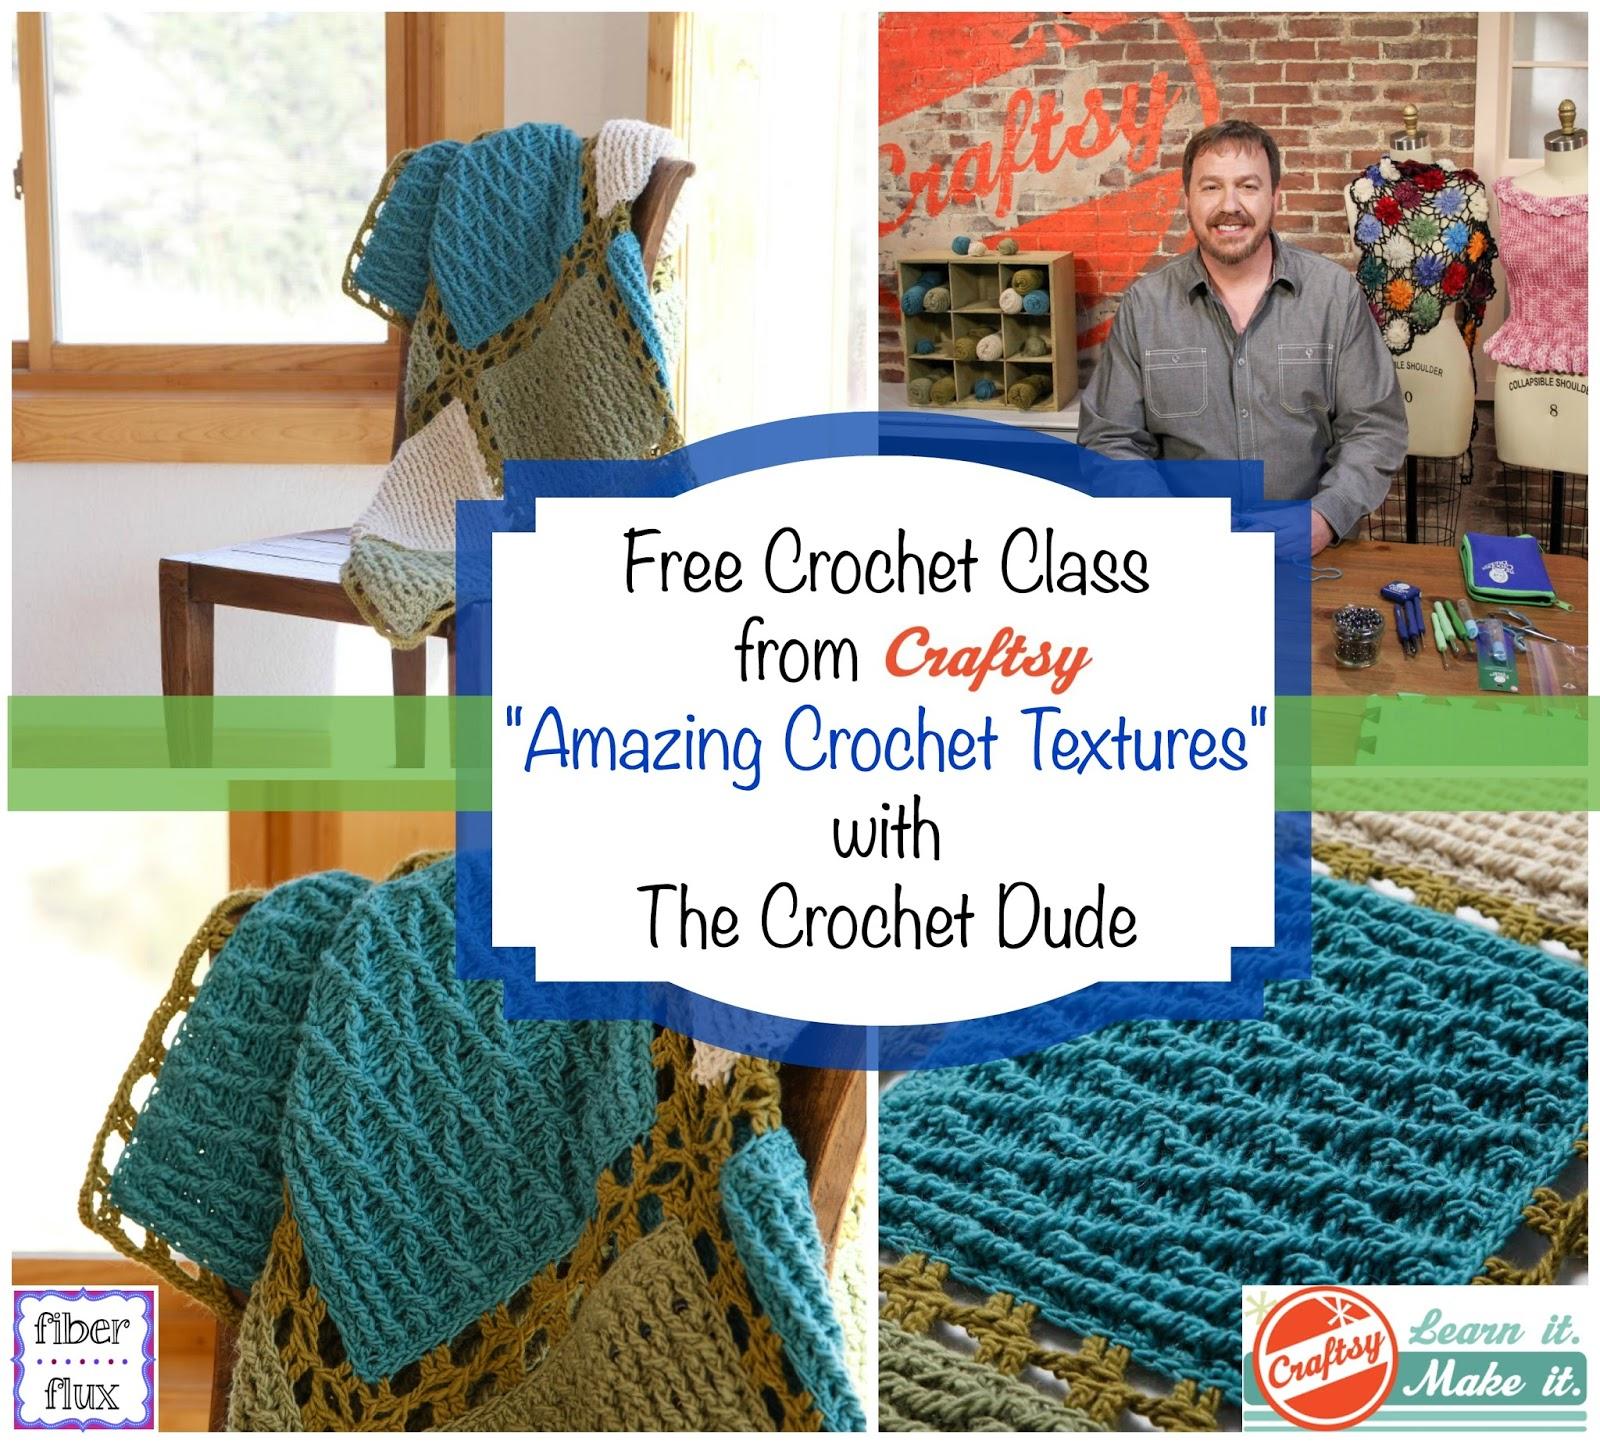 Fiber Flux: Free Crochet Class from Craftsy...Amazing Crochet ...